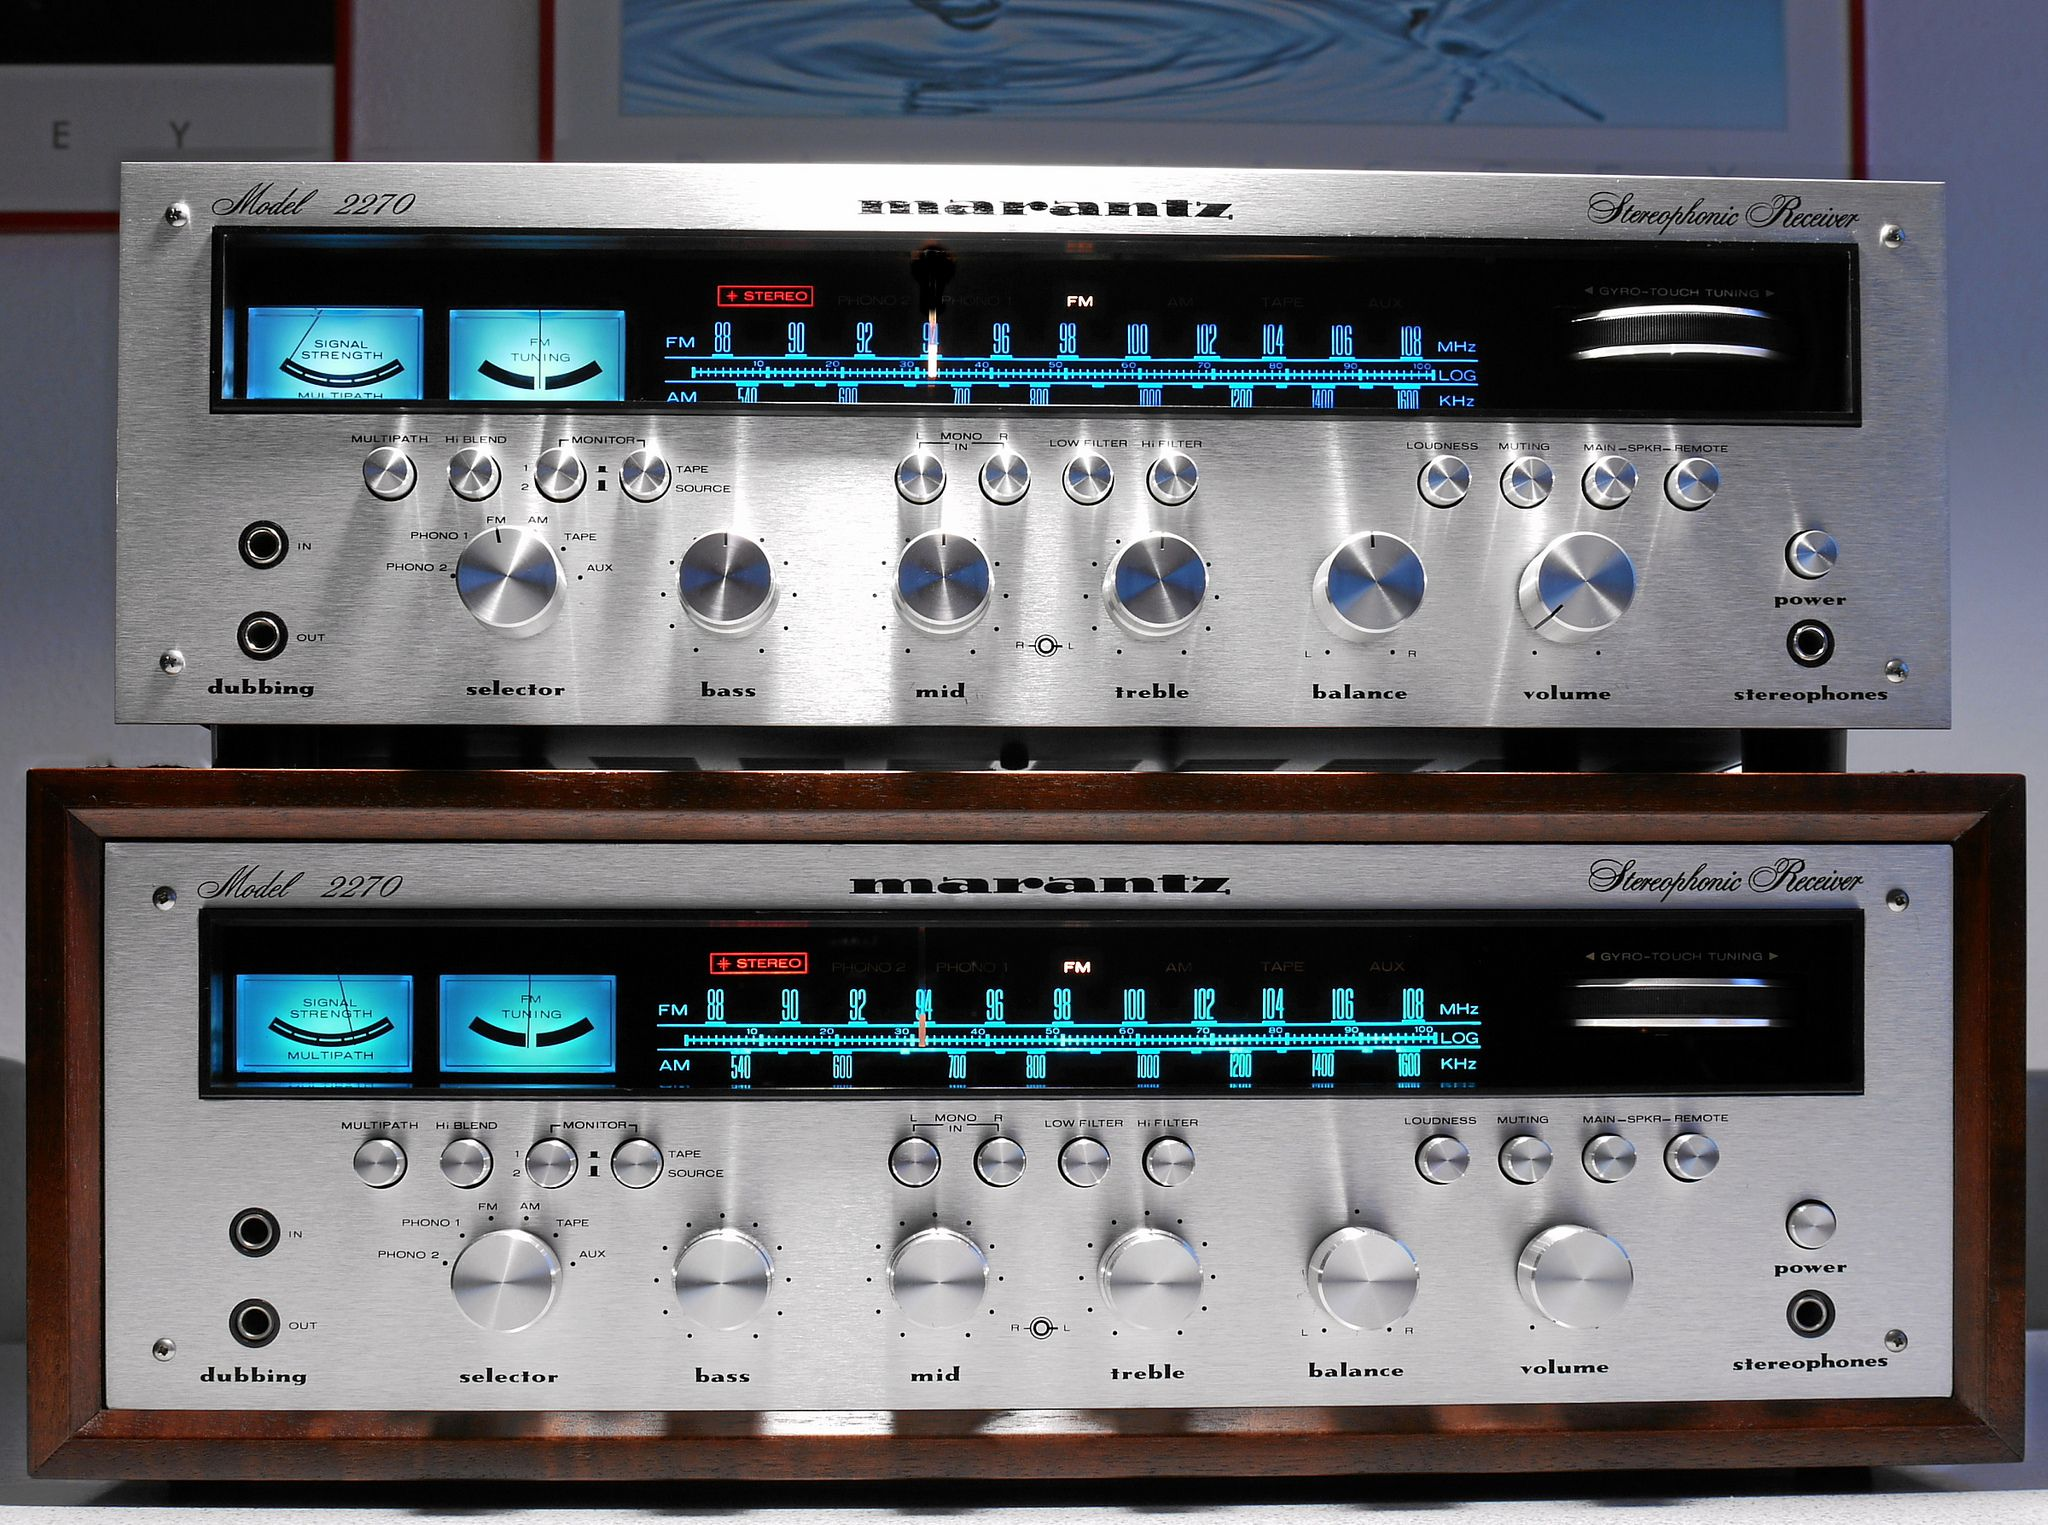 Marantz 2270 Stereo Receiver in 2019   Vintage   Hifi audio